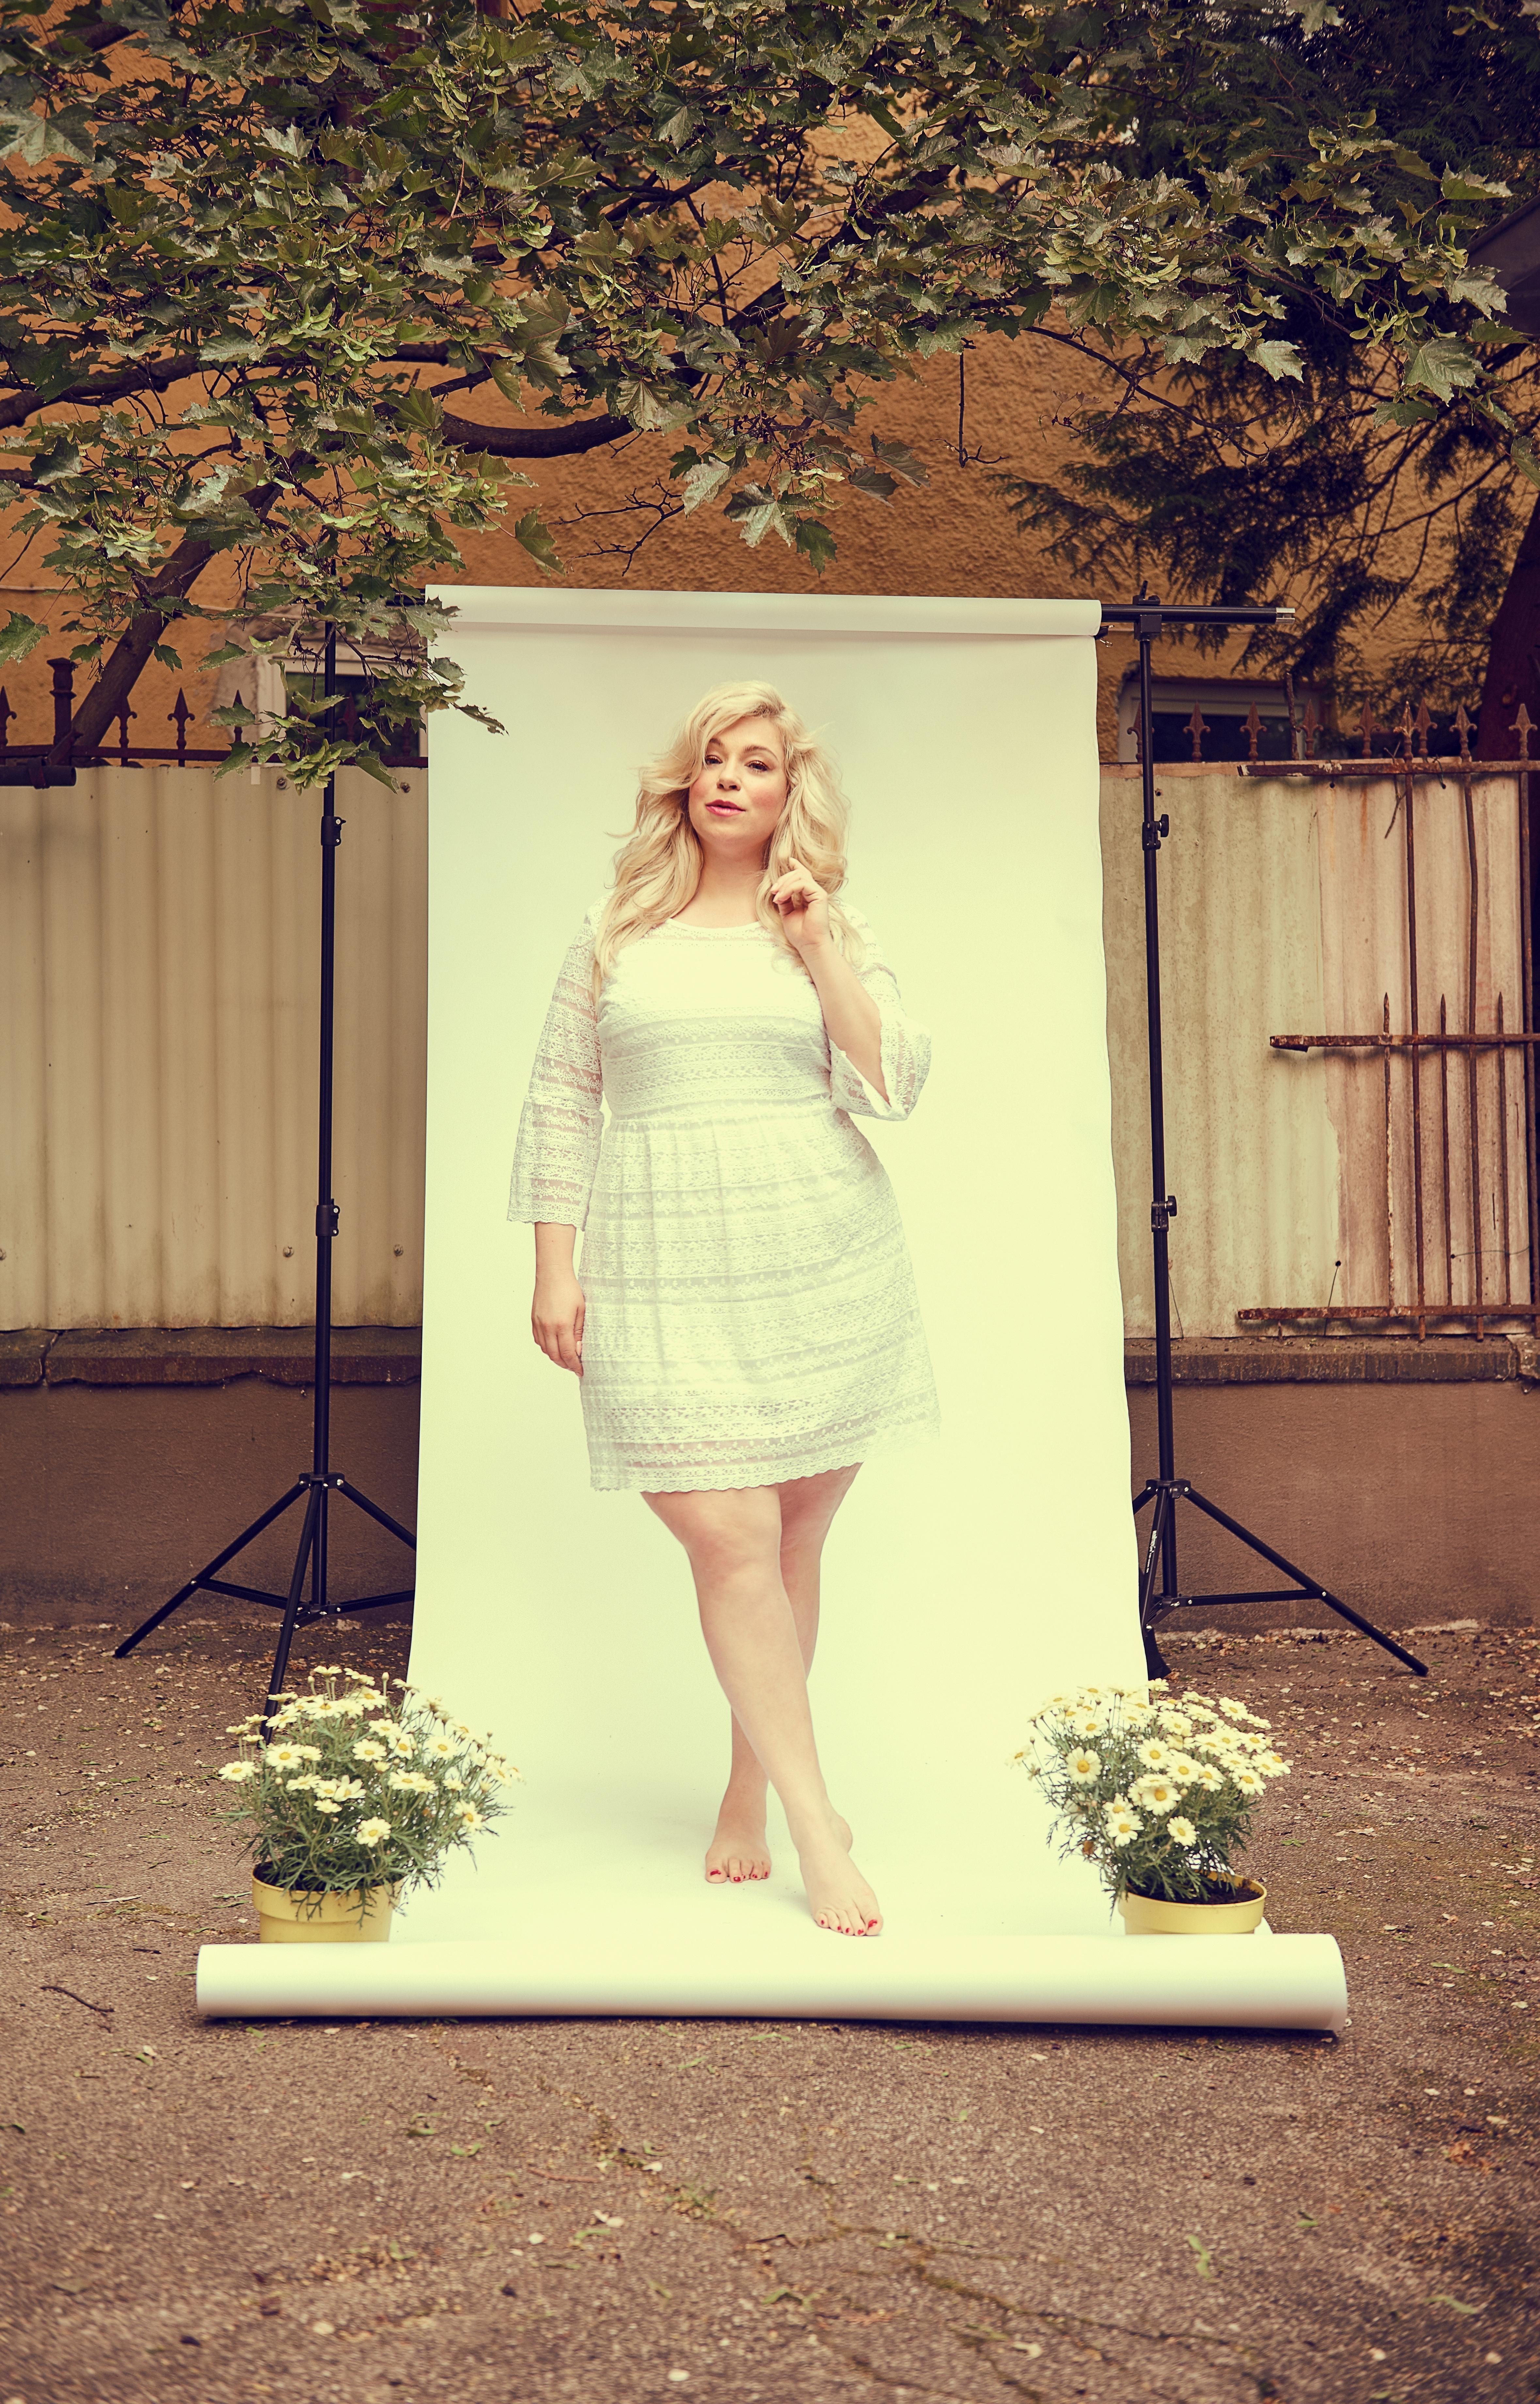 Caterina-Megabambi-The-curvymagazine-pogorzelski-Modebloggerin-Plussize